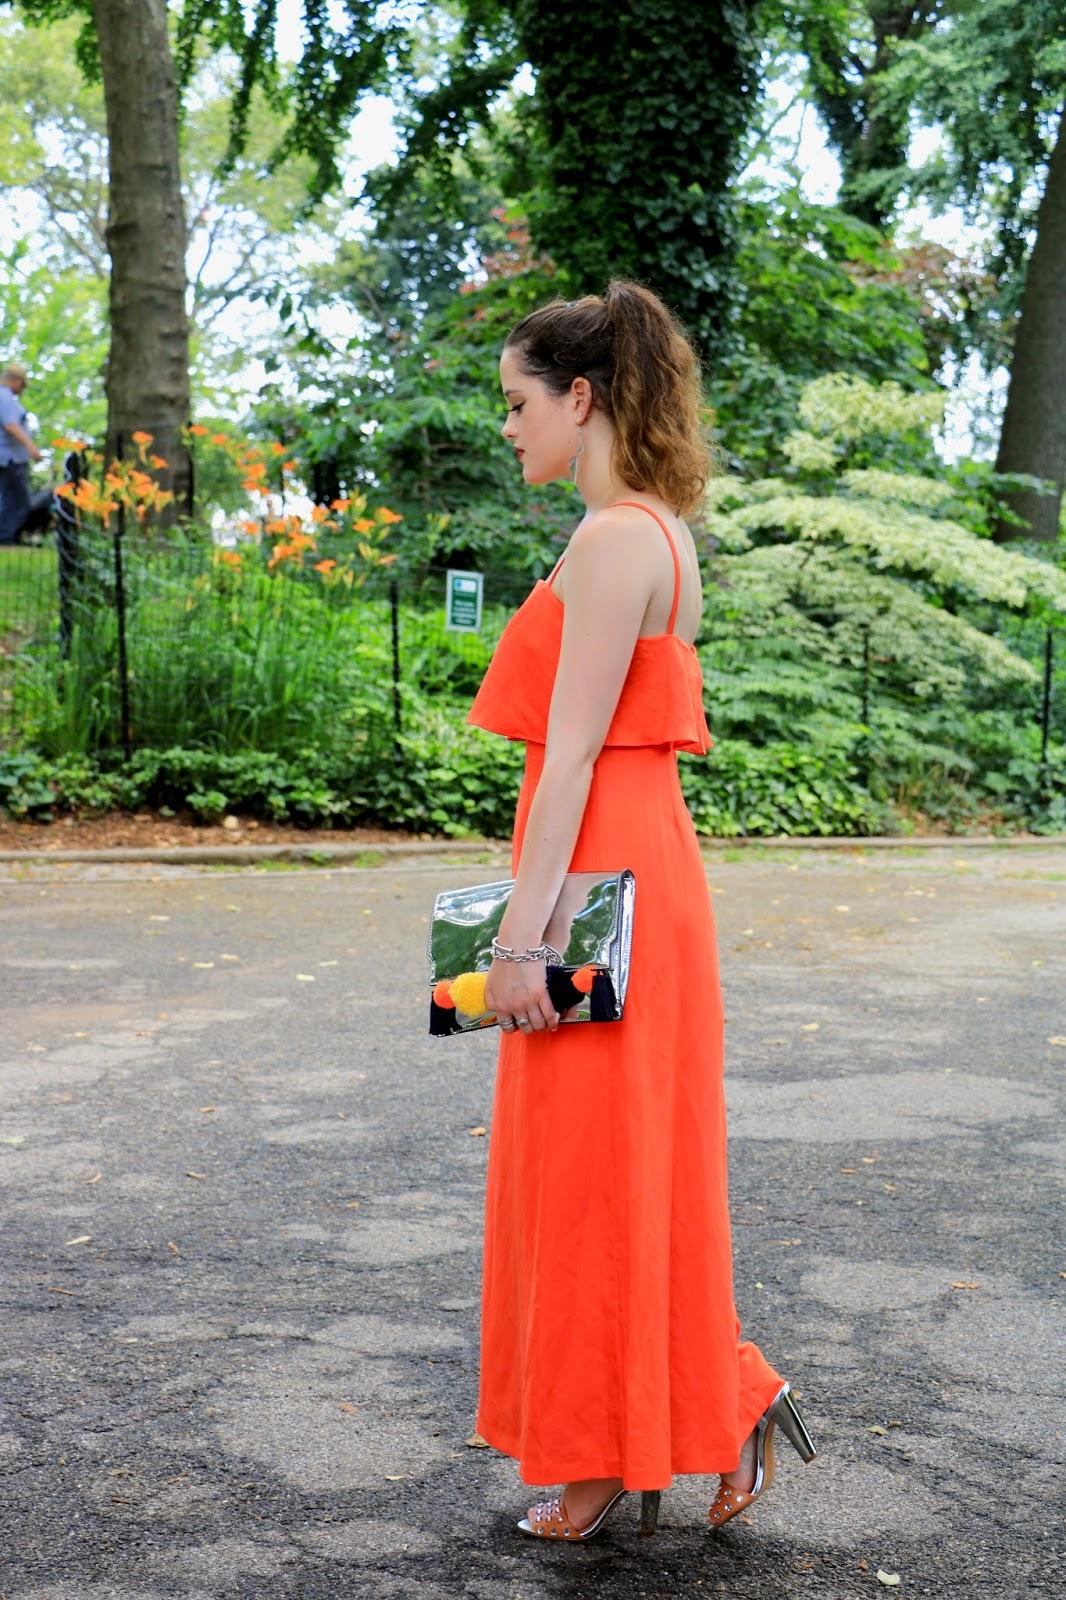 Fashion blogger Kathleen Harper of Kat's Fashion Fix wearing a summer wedding dress